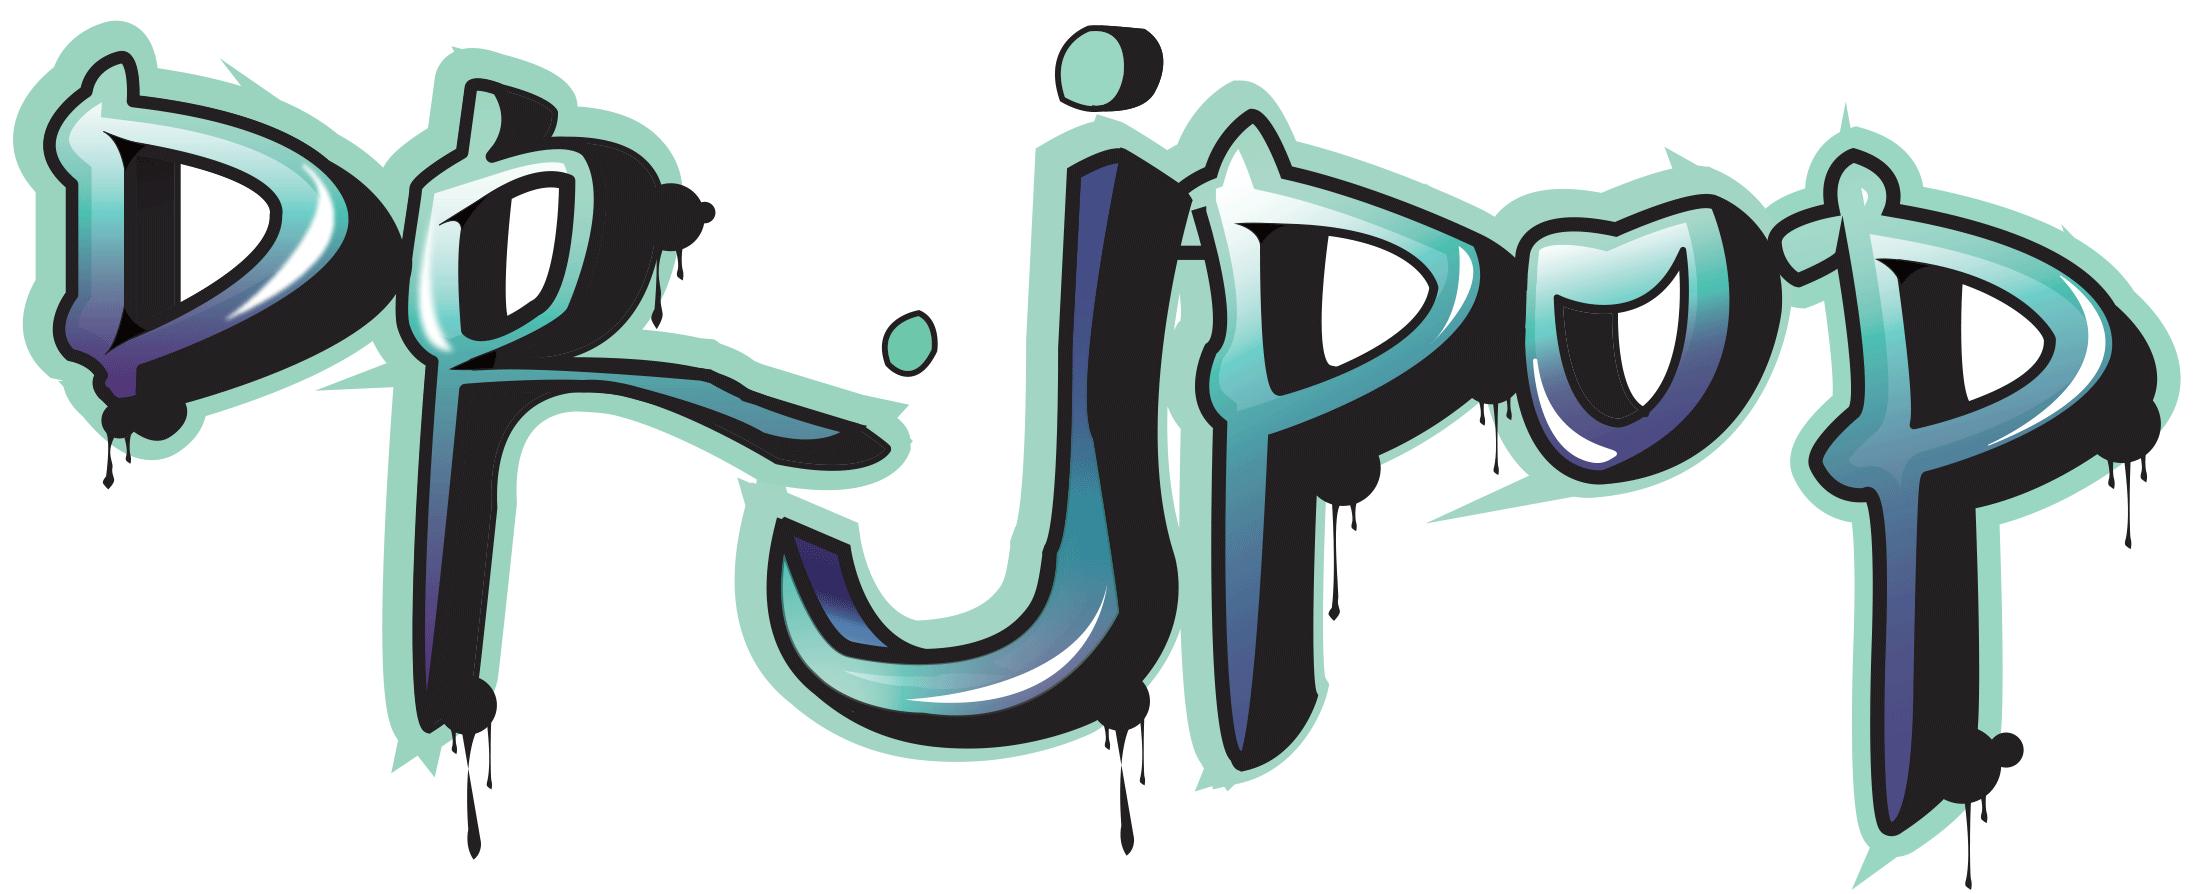 jpop logo.png